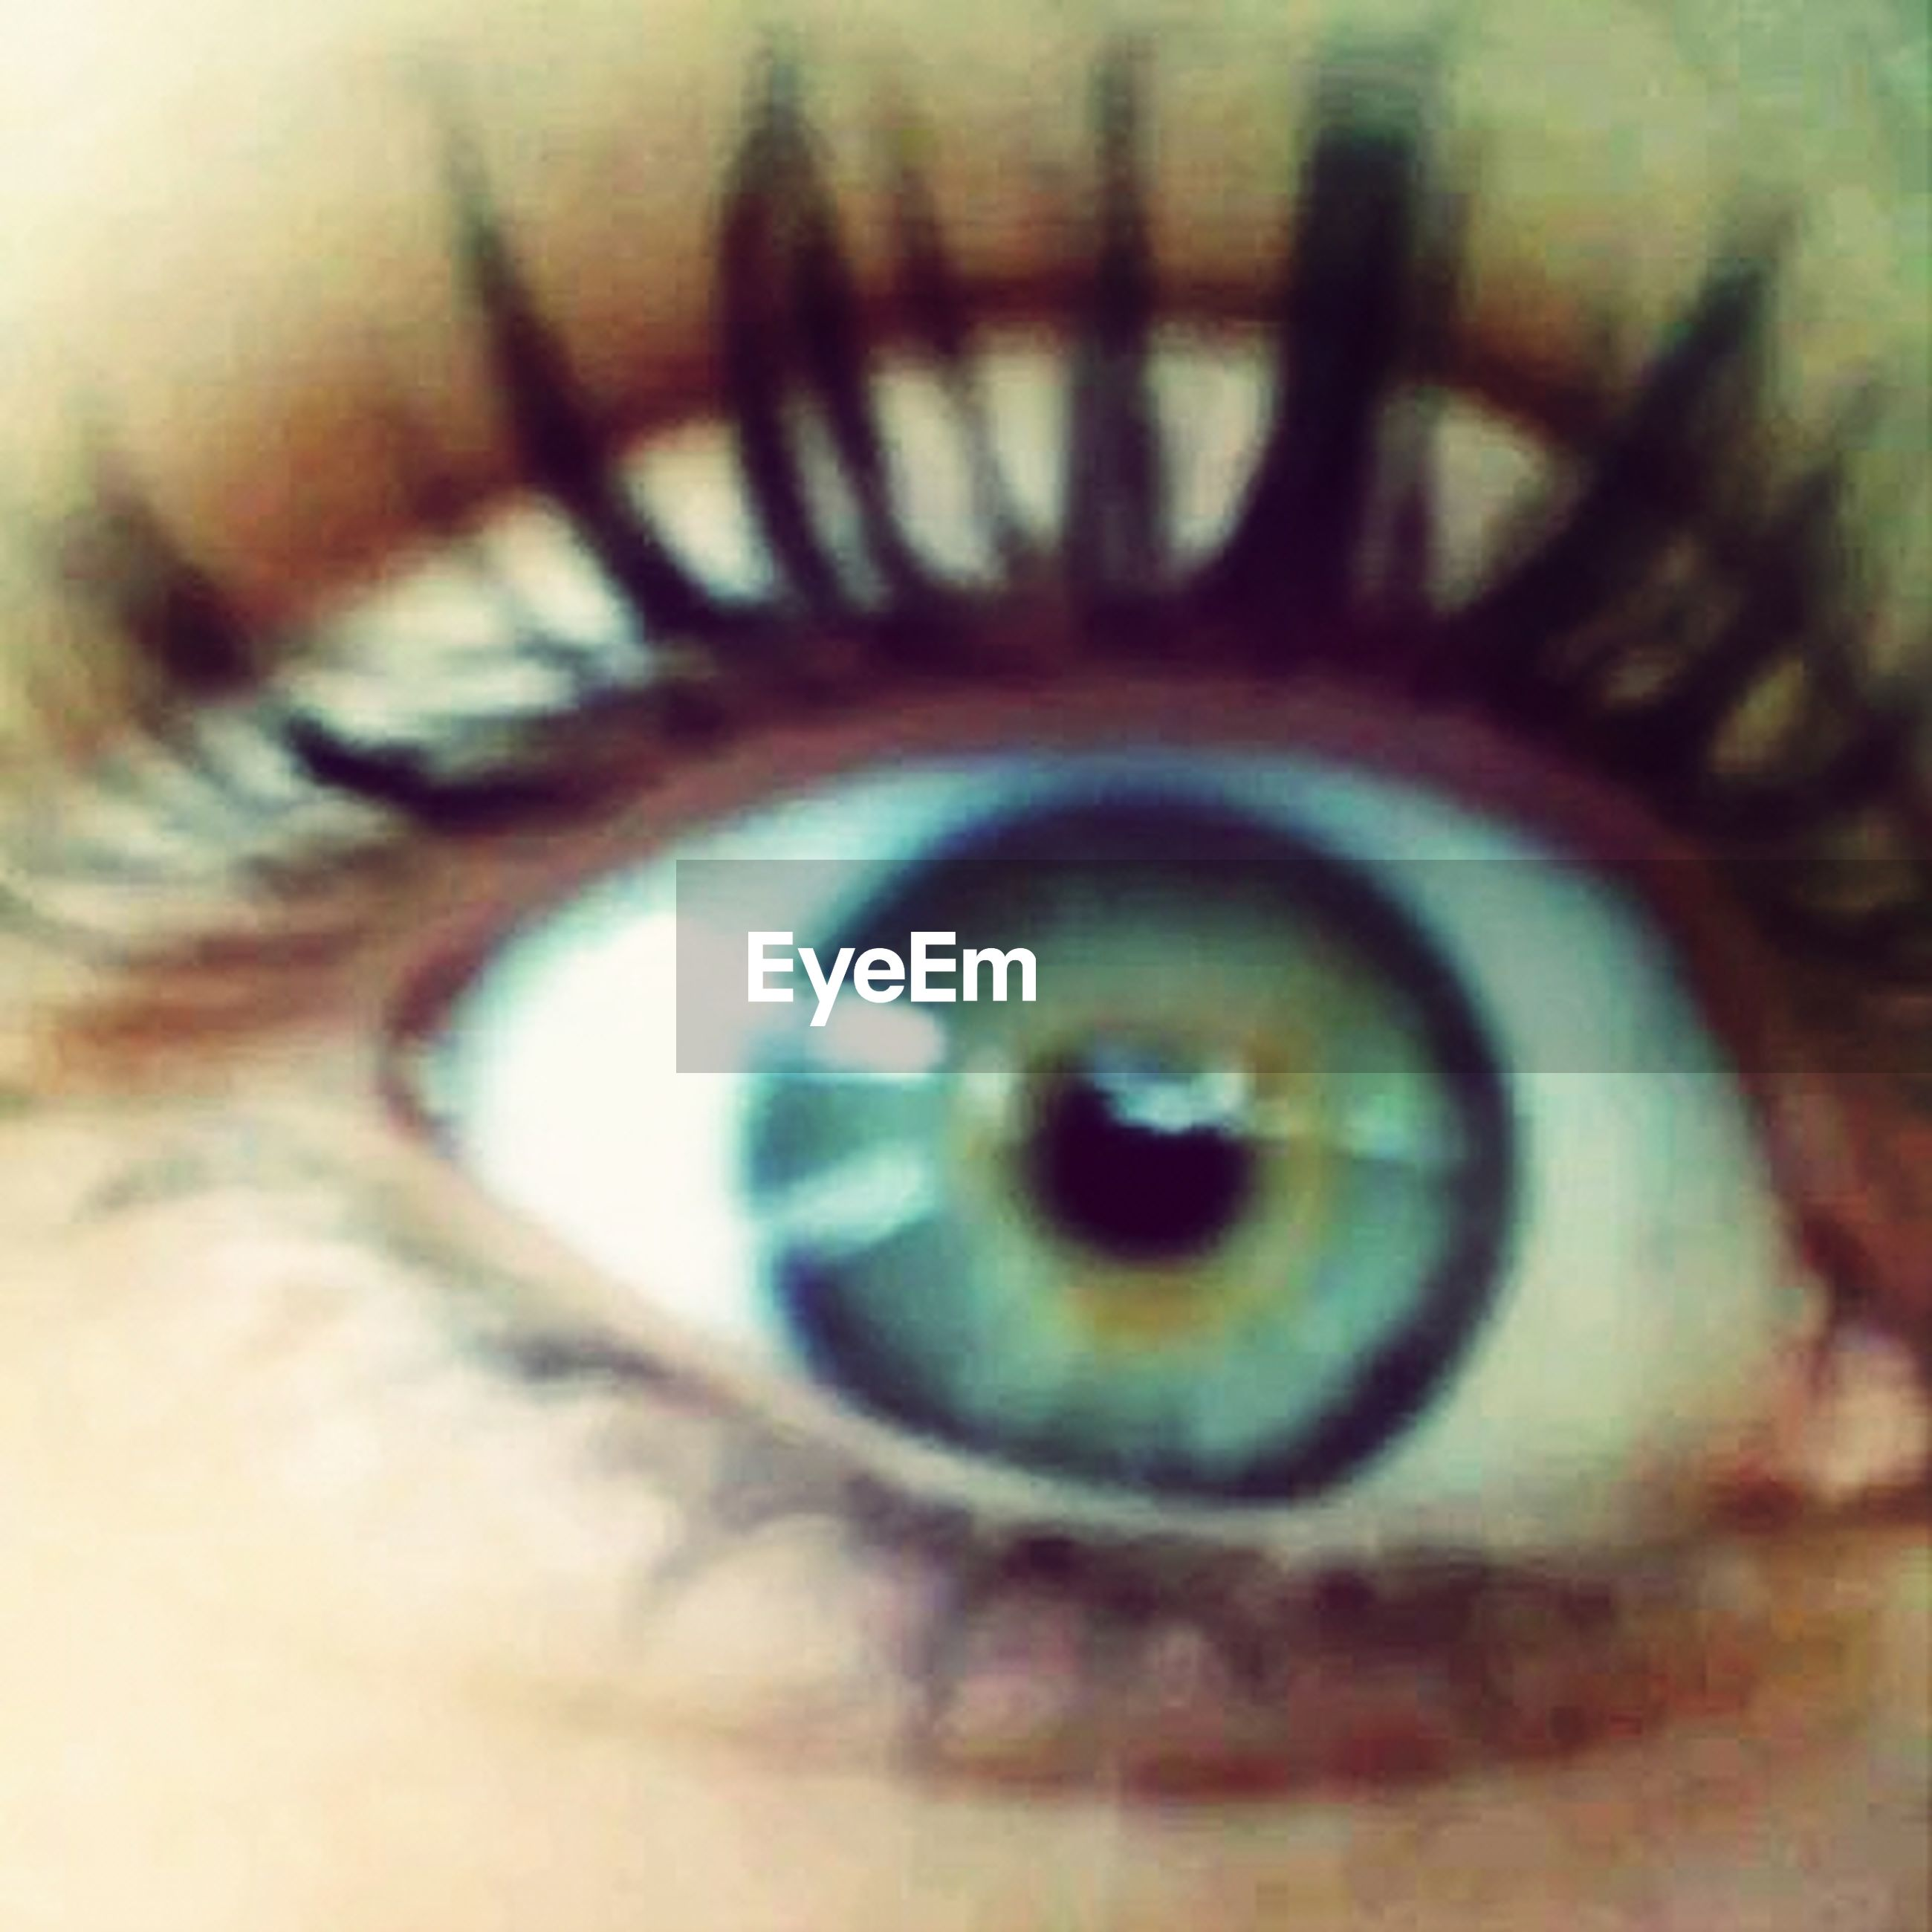 close-up, human eye, eyesight, circle, selective focus, eyelash, indoors, extreme close-up, part of, sensory perception, reflection, focus on foreground, eyeball, iris - eye, spiral, unrecognizable person, detail